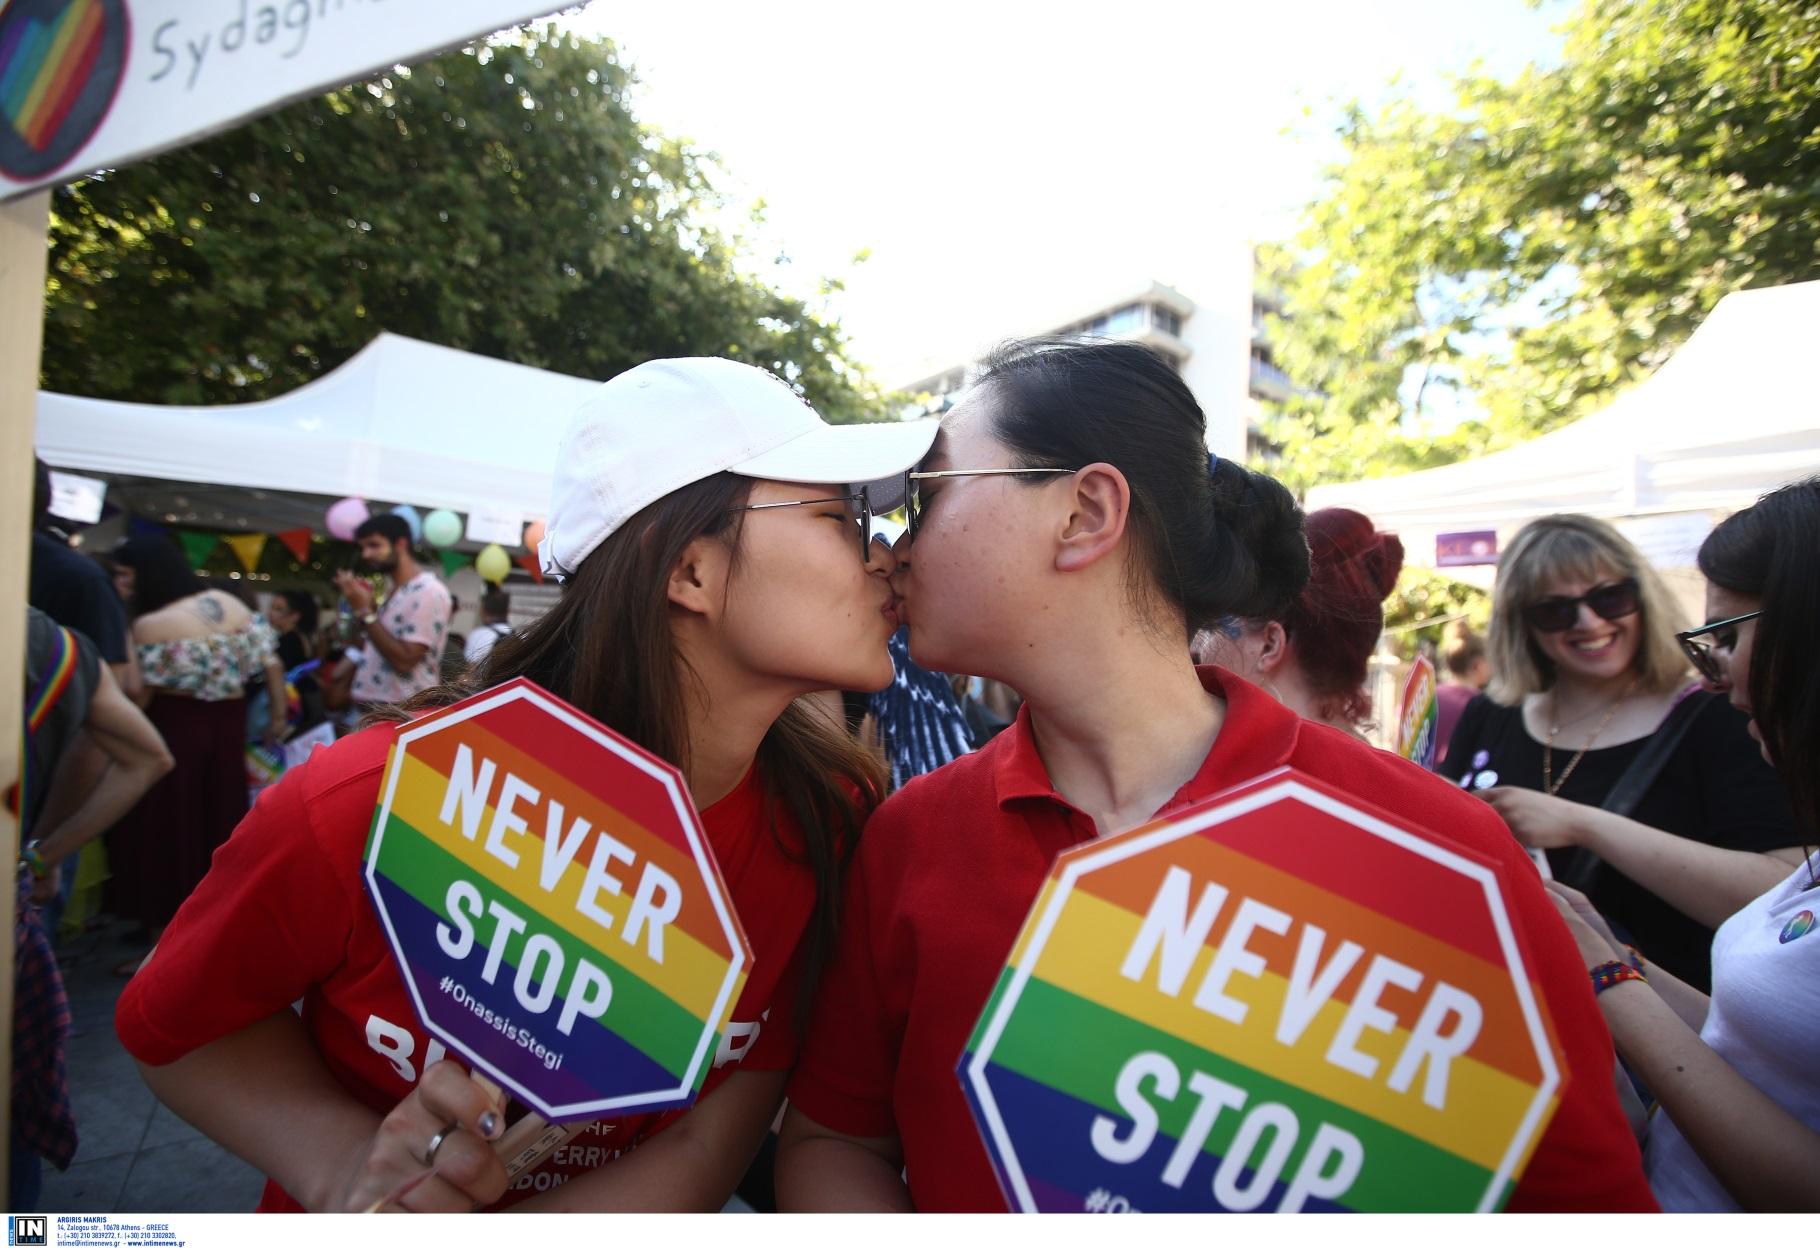 Athens Pride 2021: «Αυτό που μας ενώνει – Η κοινωνία έτοιμη, οι κυβερνήσεις όχι»